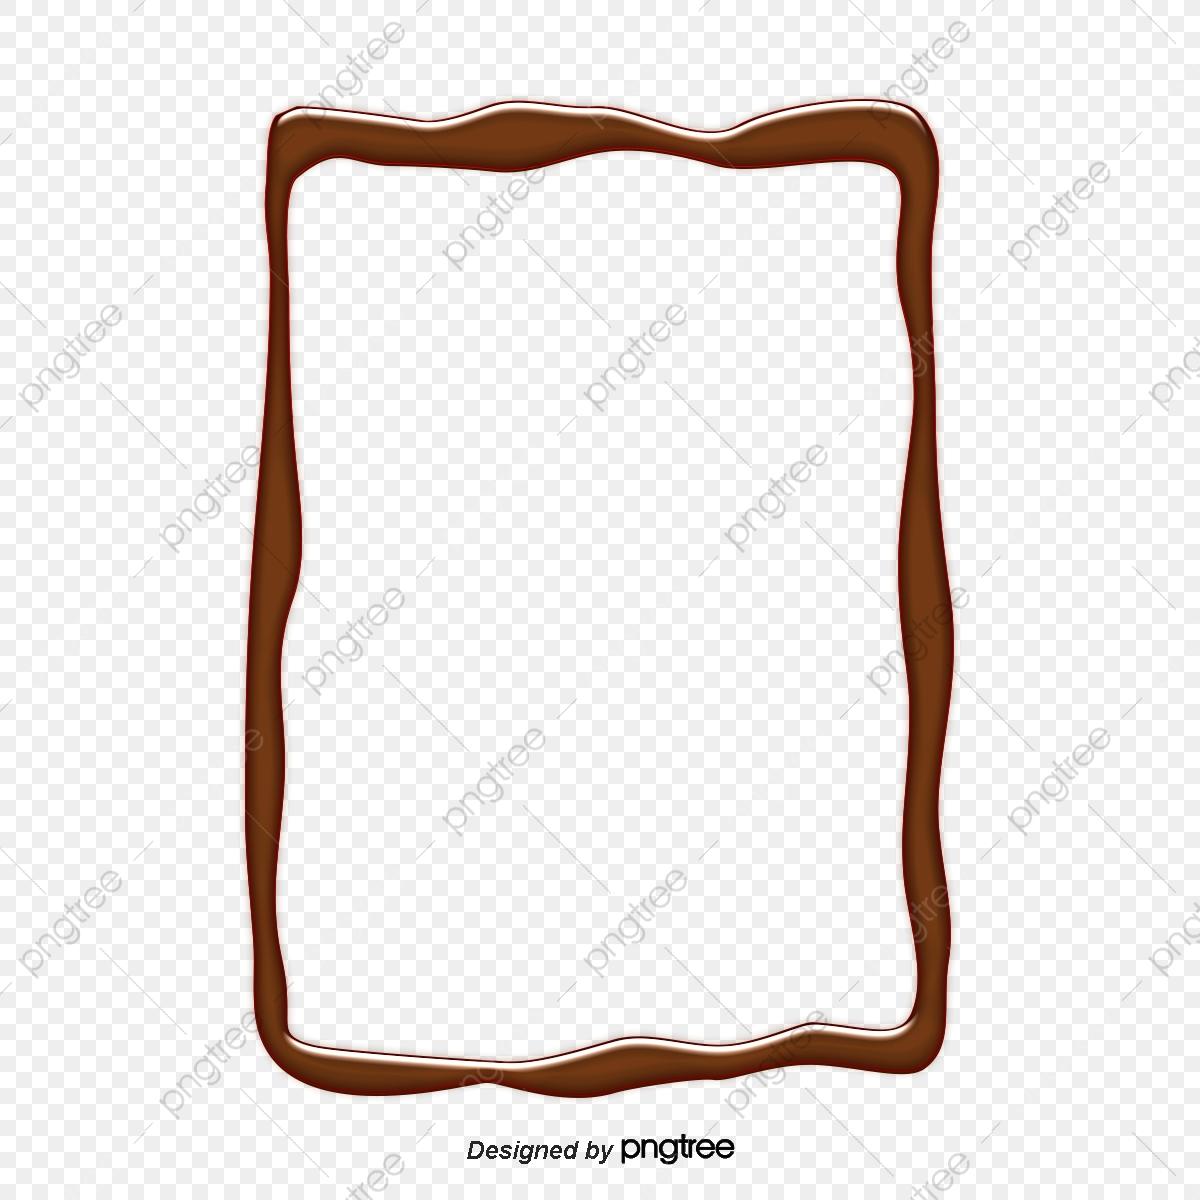 Chocolate clipart border. Design of elements illustration